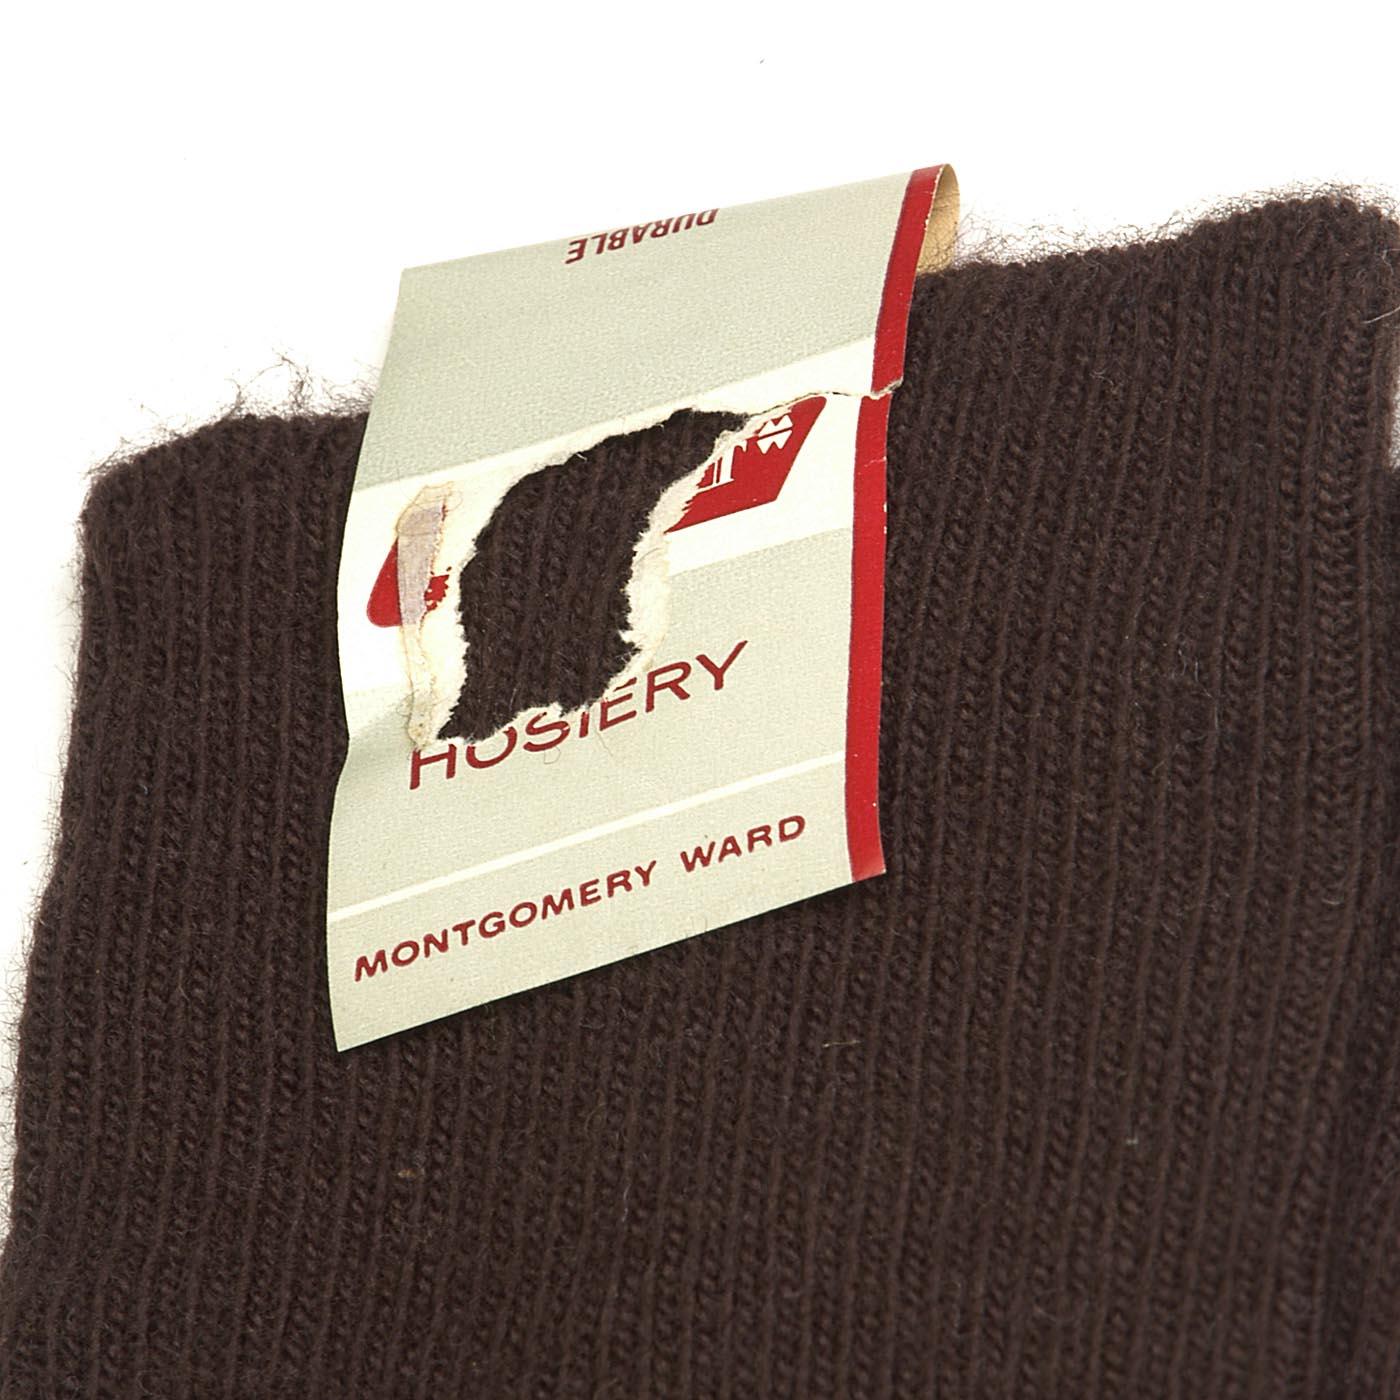 Clothing, Shoes & Accessories 1950s Deadstock Black Dress Socks Vtg Hose Silky Sheer Nylon Cotton Rib Knit Top